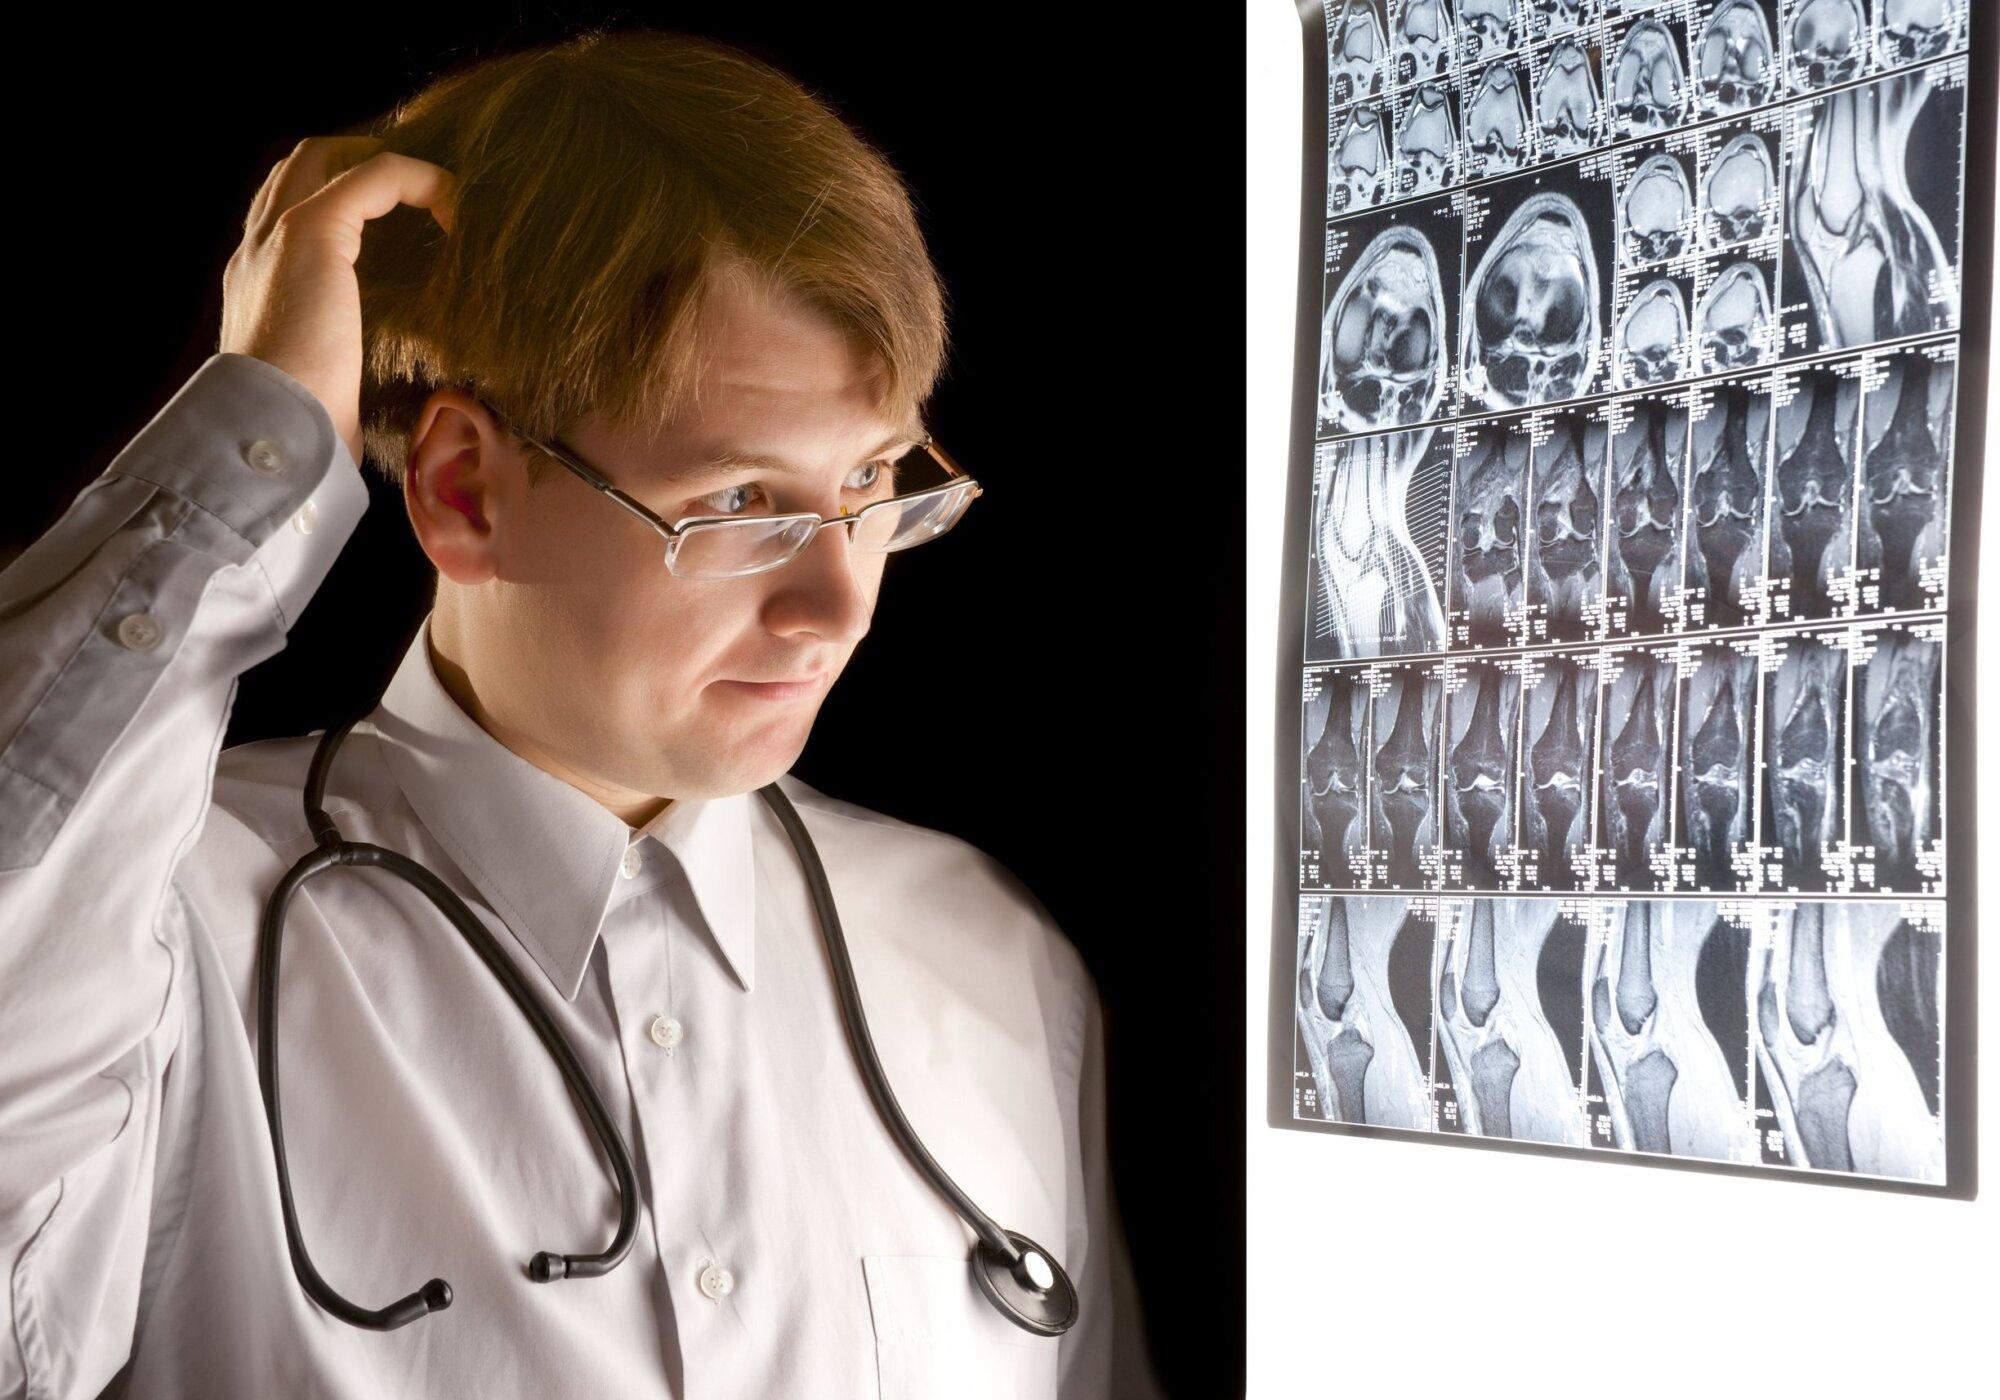 Uncertainty in Medicine